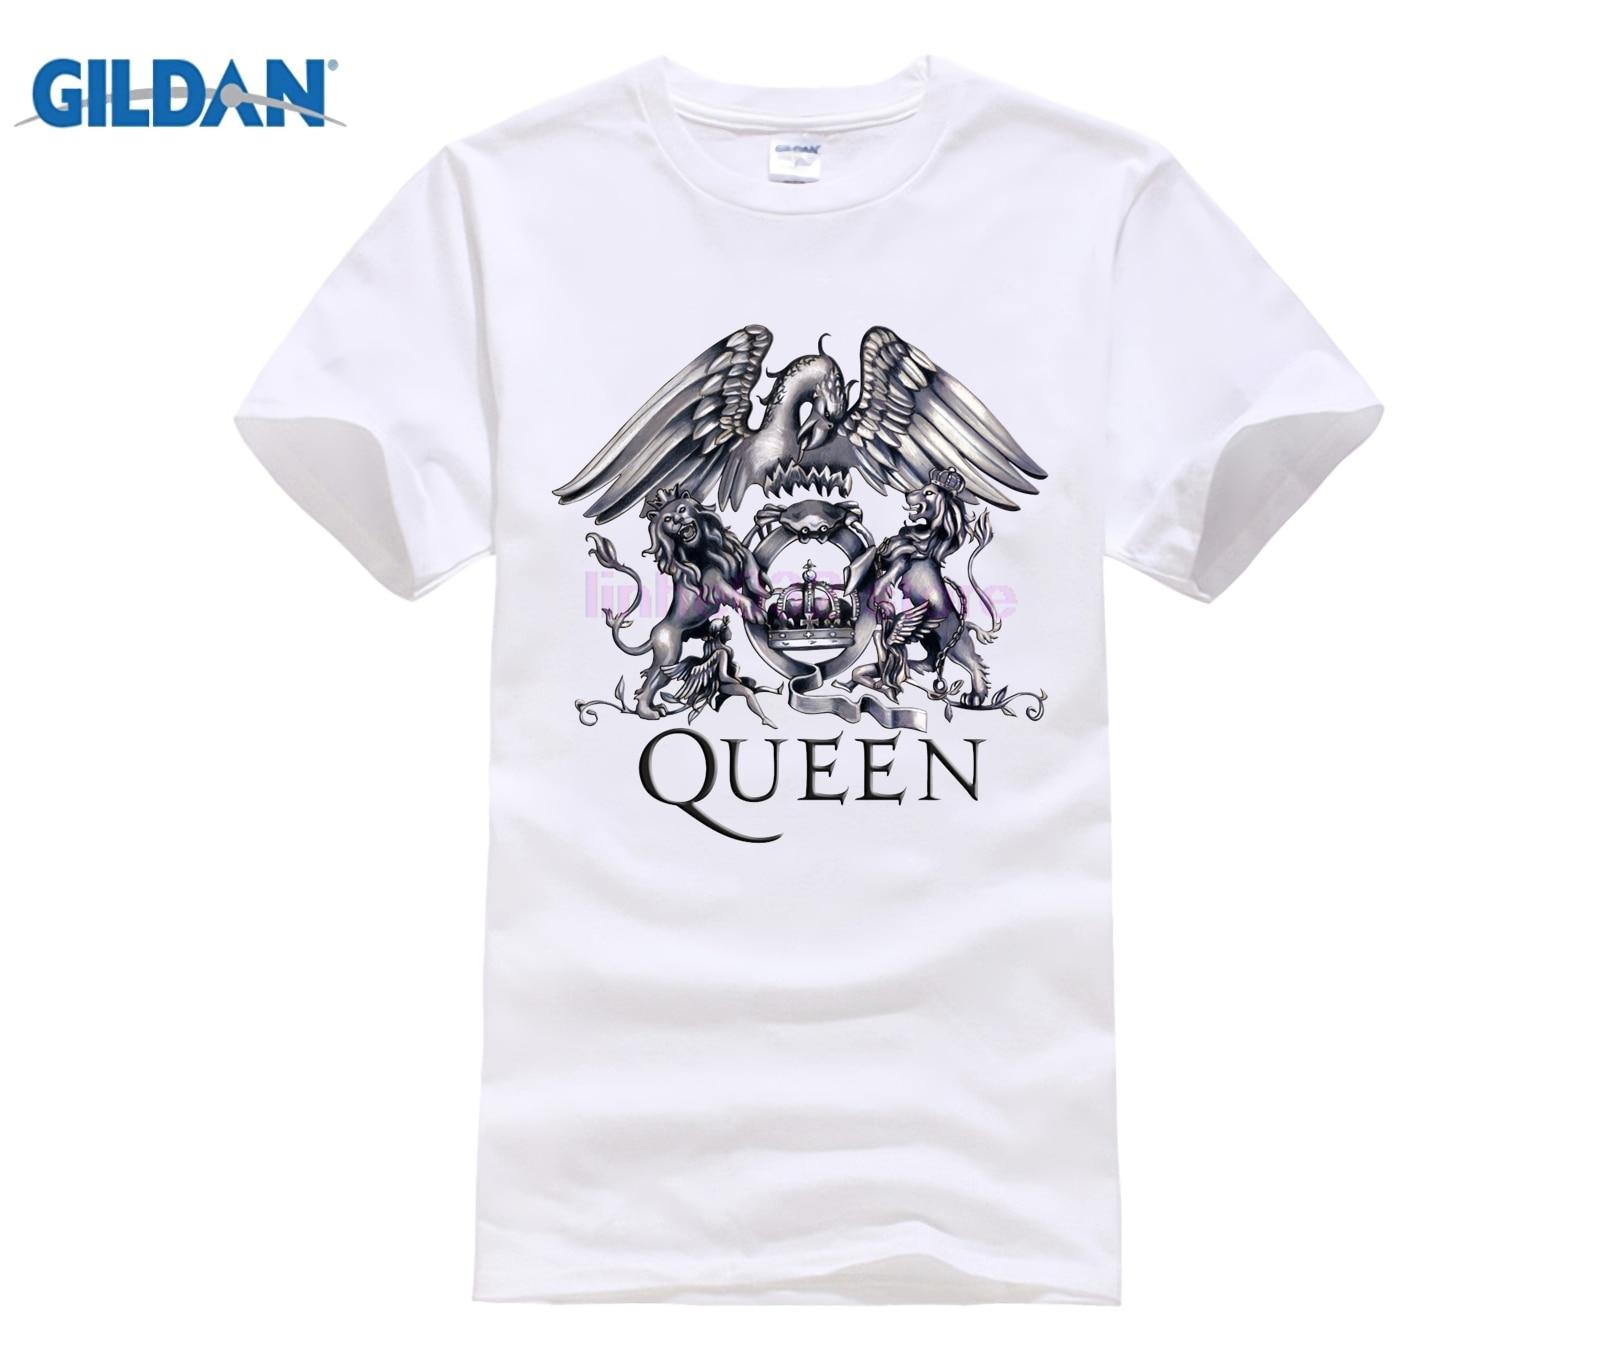 955c988e011 QUEEN Rock Band T shirt Homme Cotton 3D Print Freddie Mercury Shirt O-neck  Short